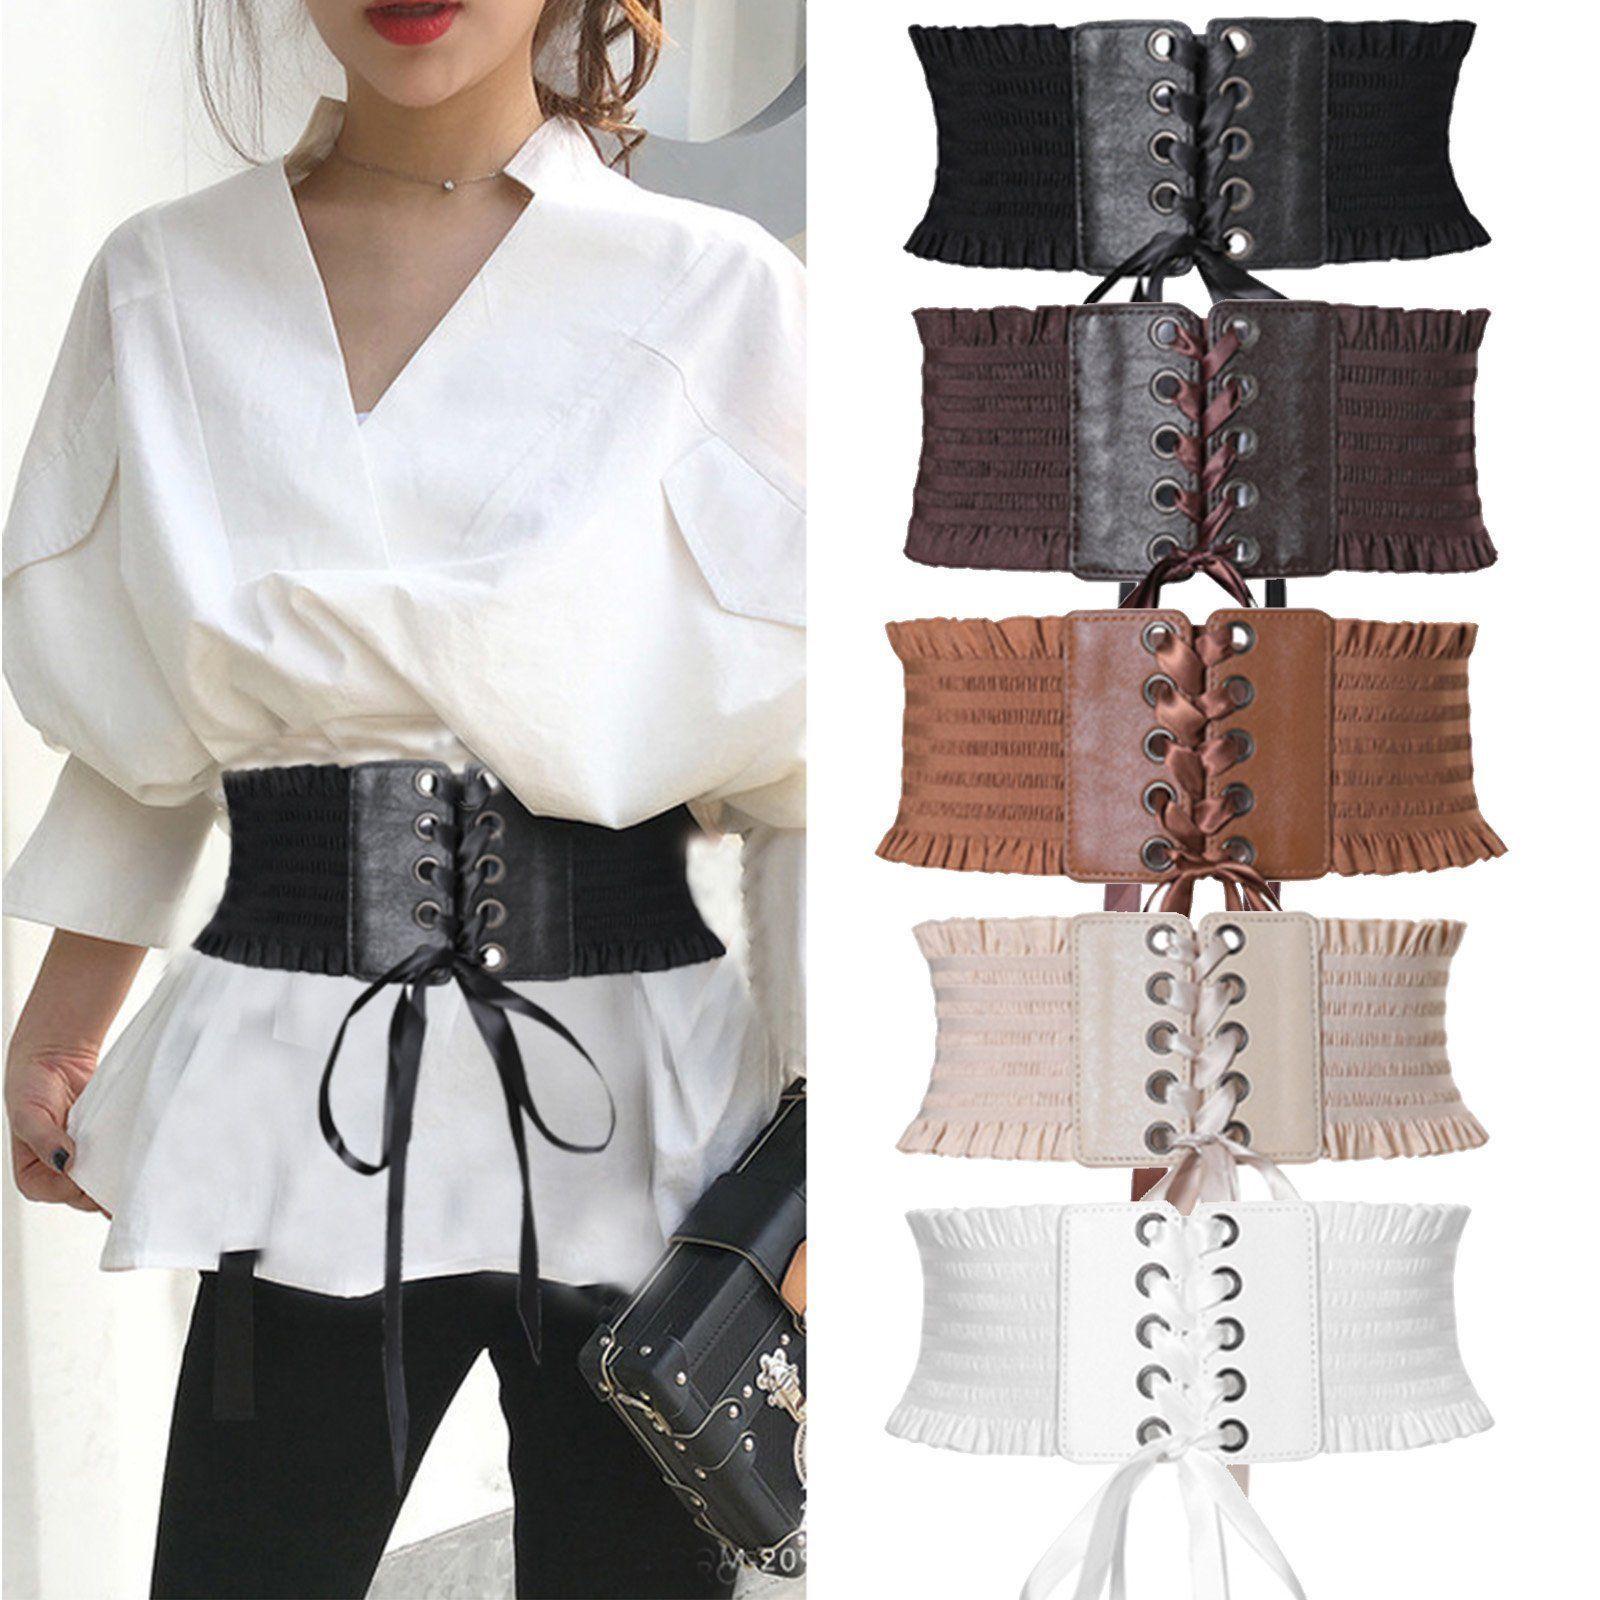 Hirigin Sexy Bandage Fashion Belts For Women Harajuku Slim Wasitband Big Designer Women Belt Wide Elastic Waistbelts